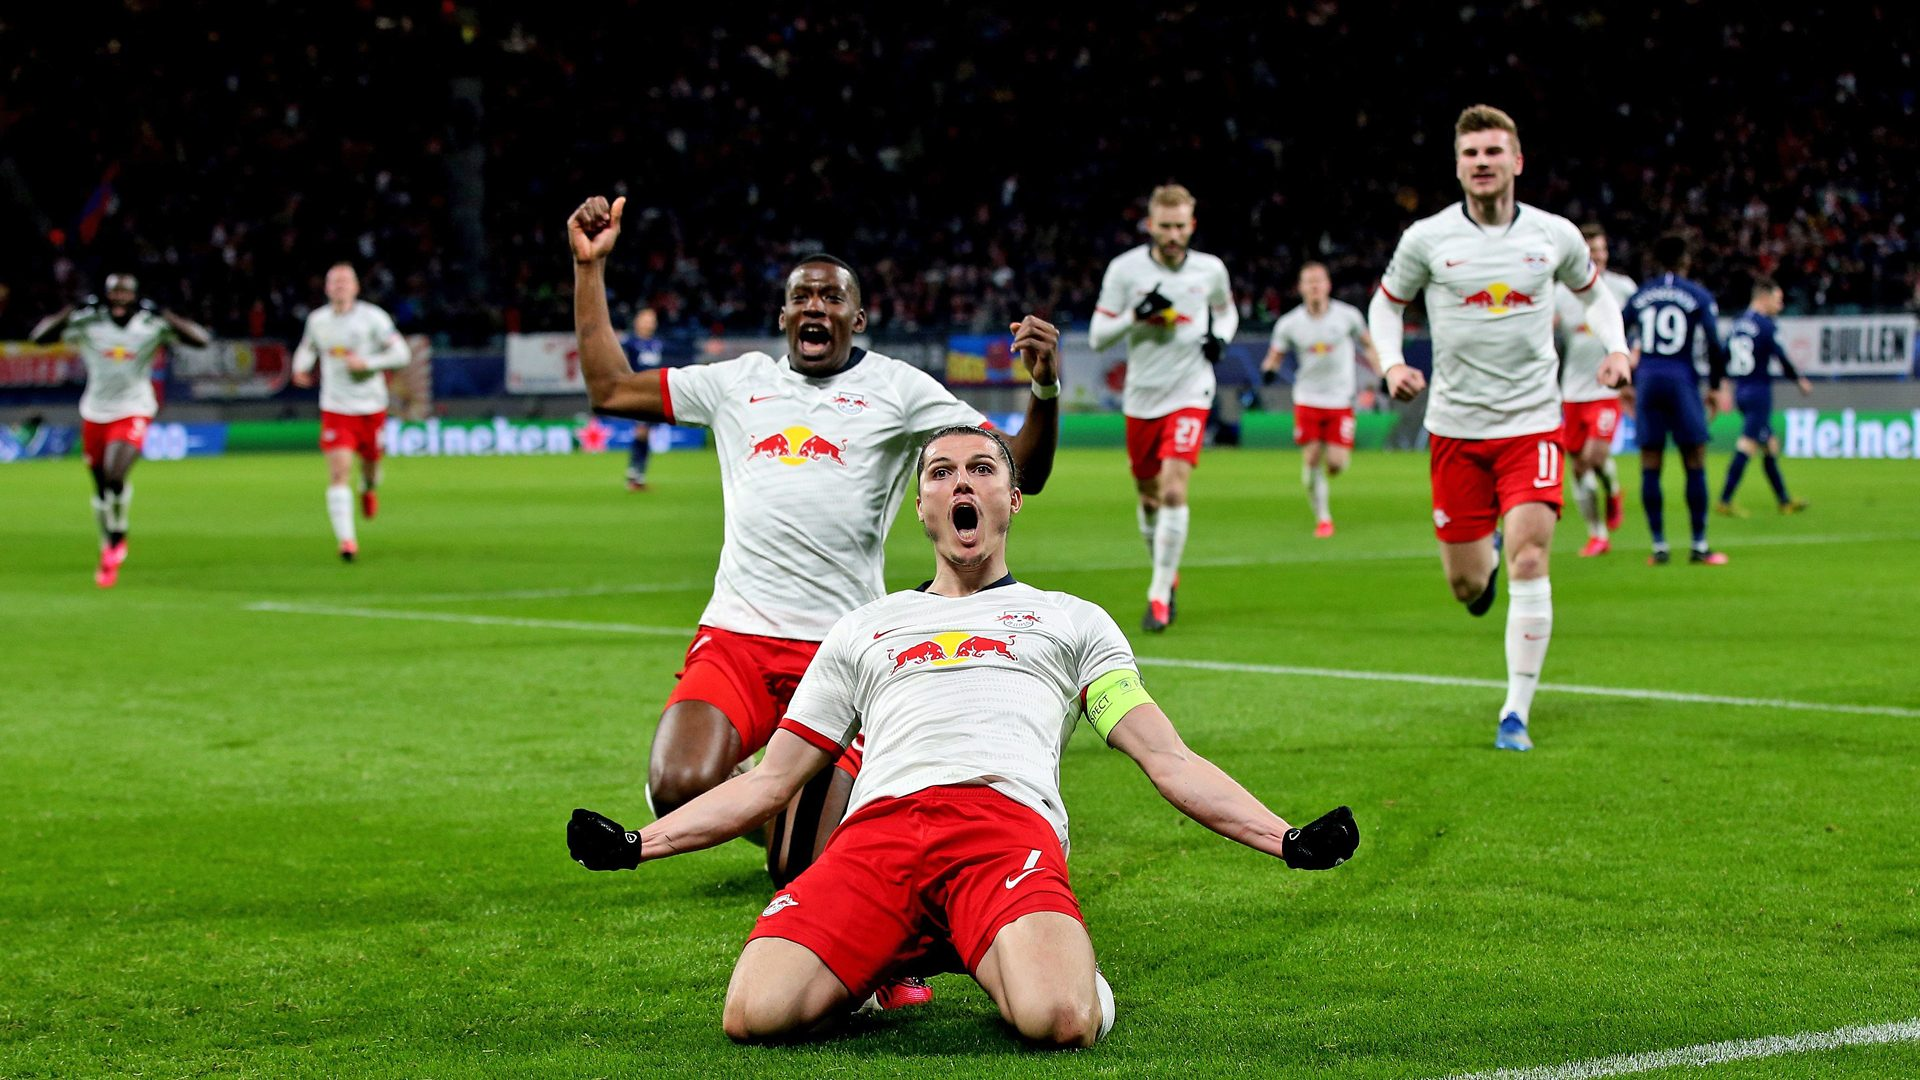 Bundesliga Marcel Sabitzer Inspired Rb Leipzig Ease Into Champions League Quarter Finals With Tottenham Hotspur Demolition